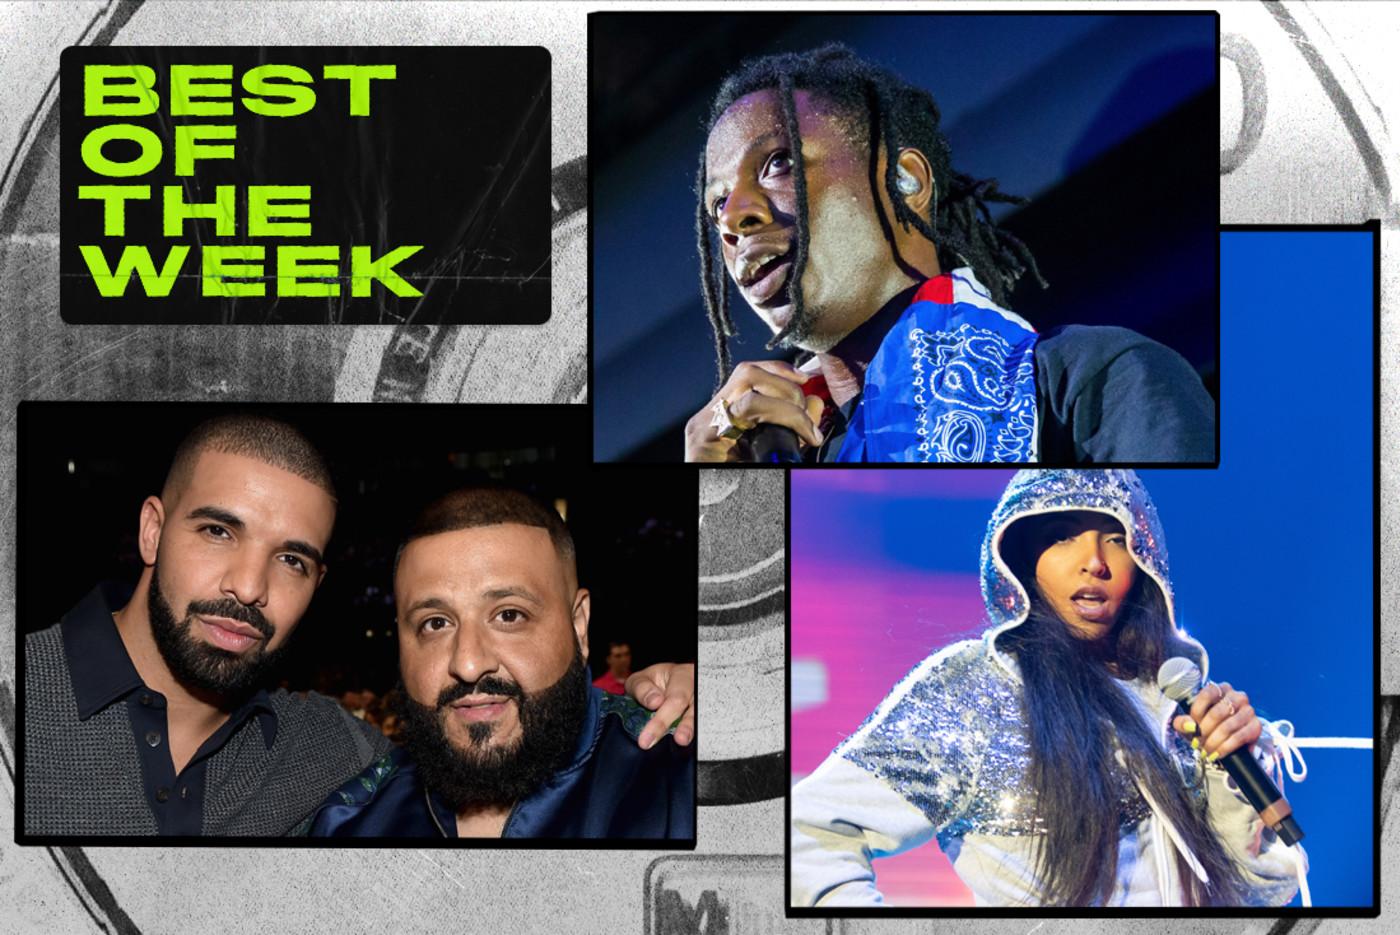 best-new-music-this-week-khaled